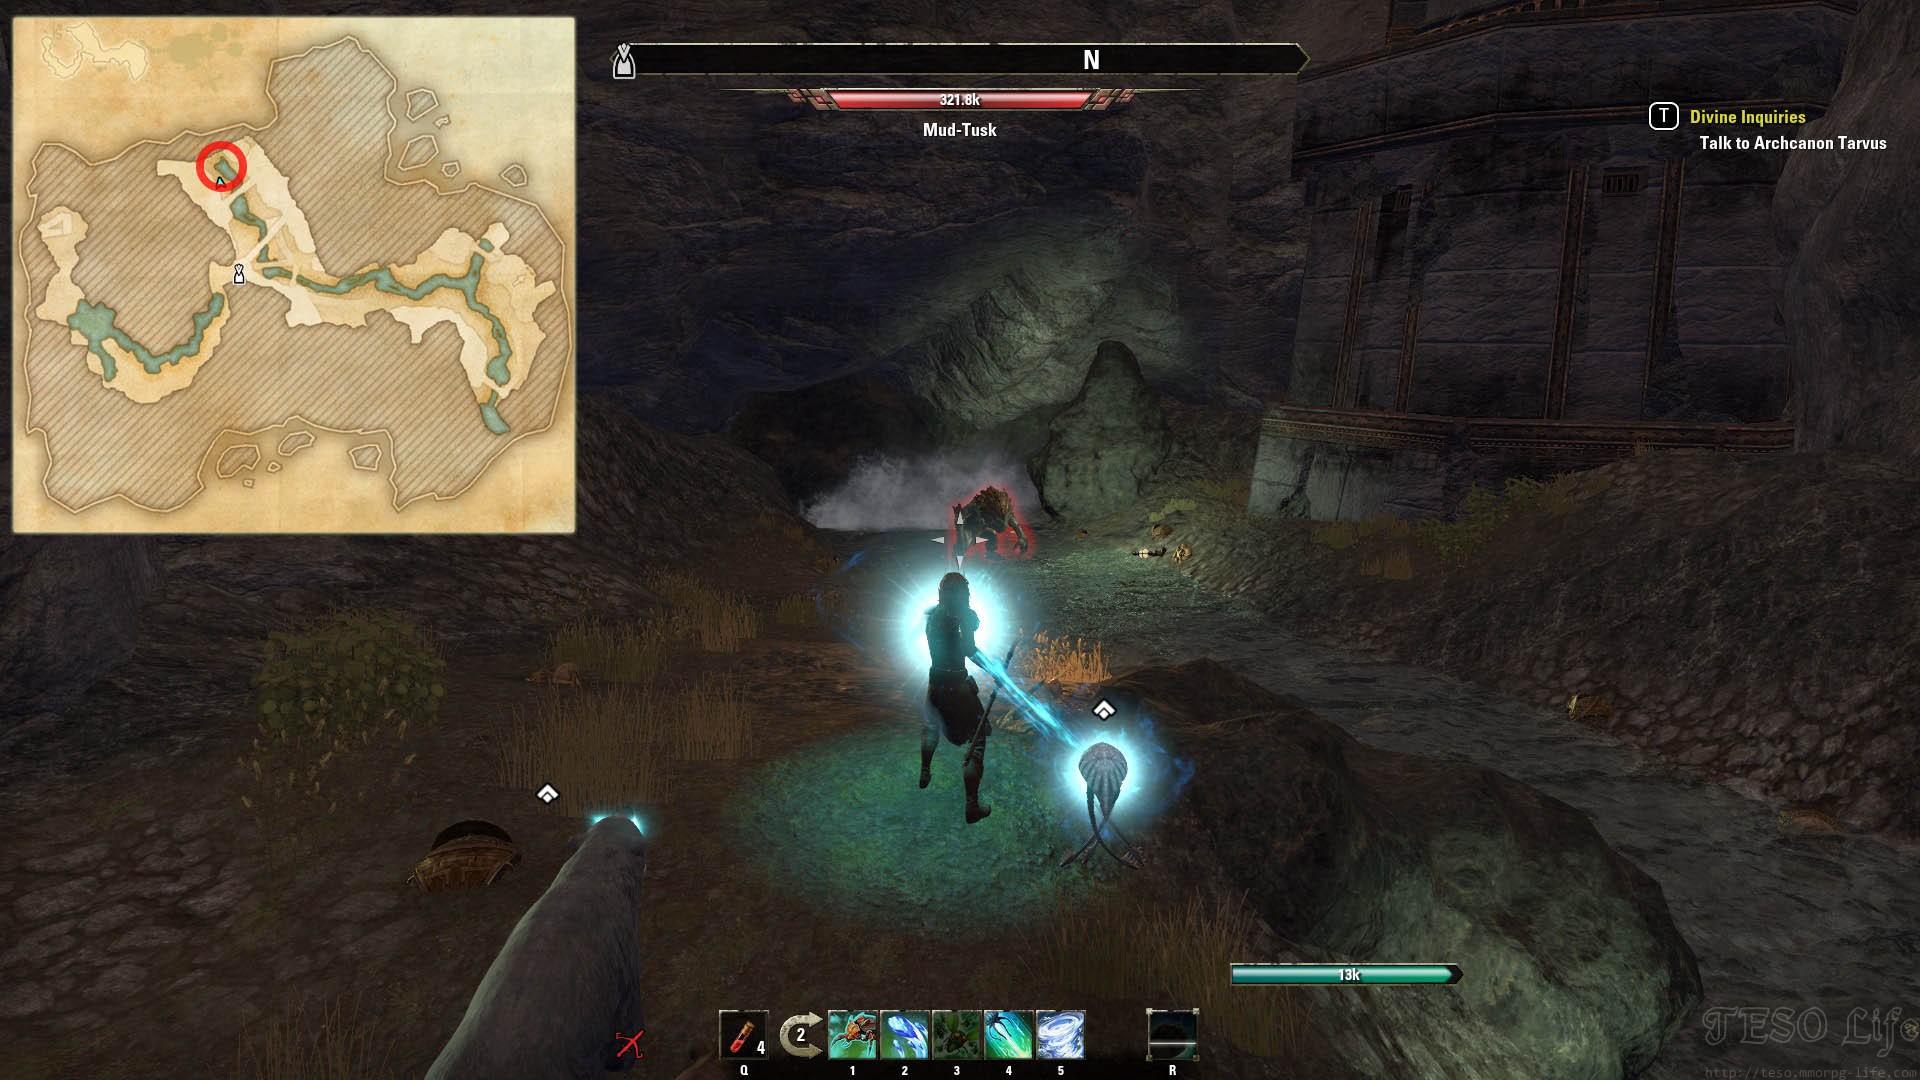 Nchuleftingth Boss Mud-Tusk Location ESO Morrowind